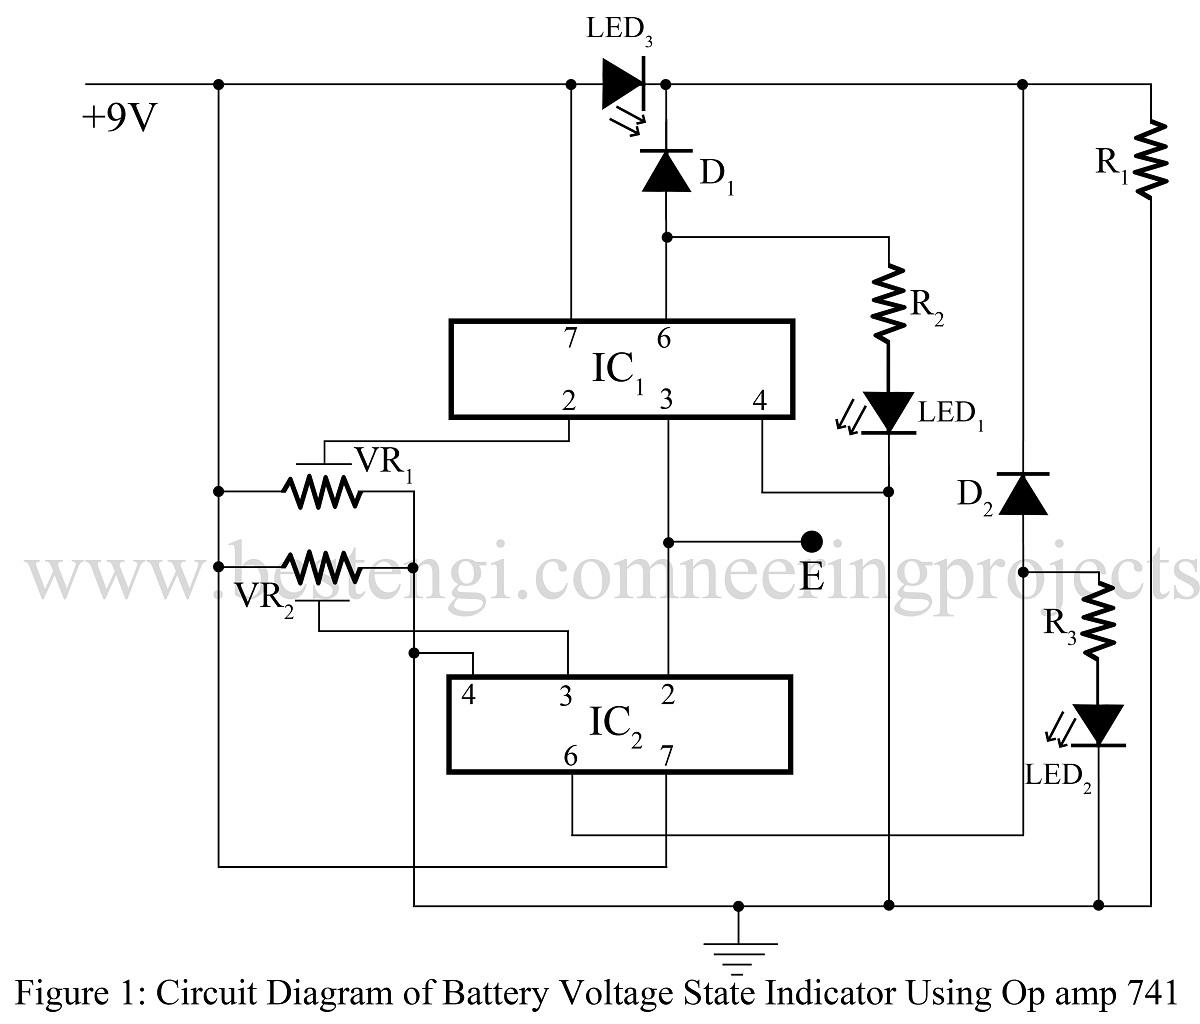 hight resolution of 9v led wiring diagram 3